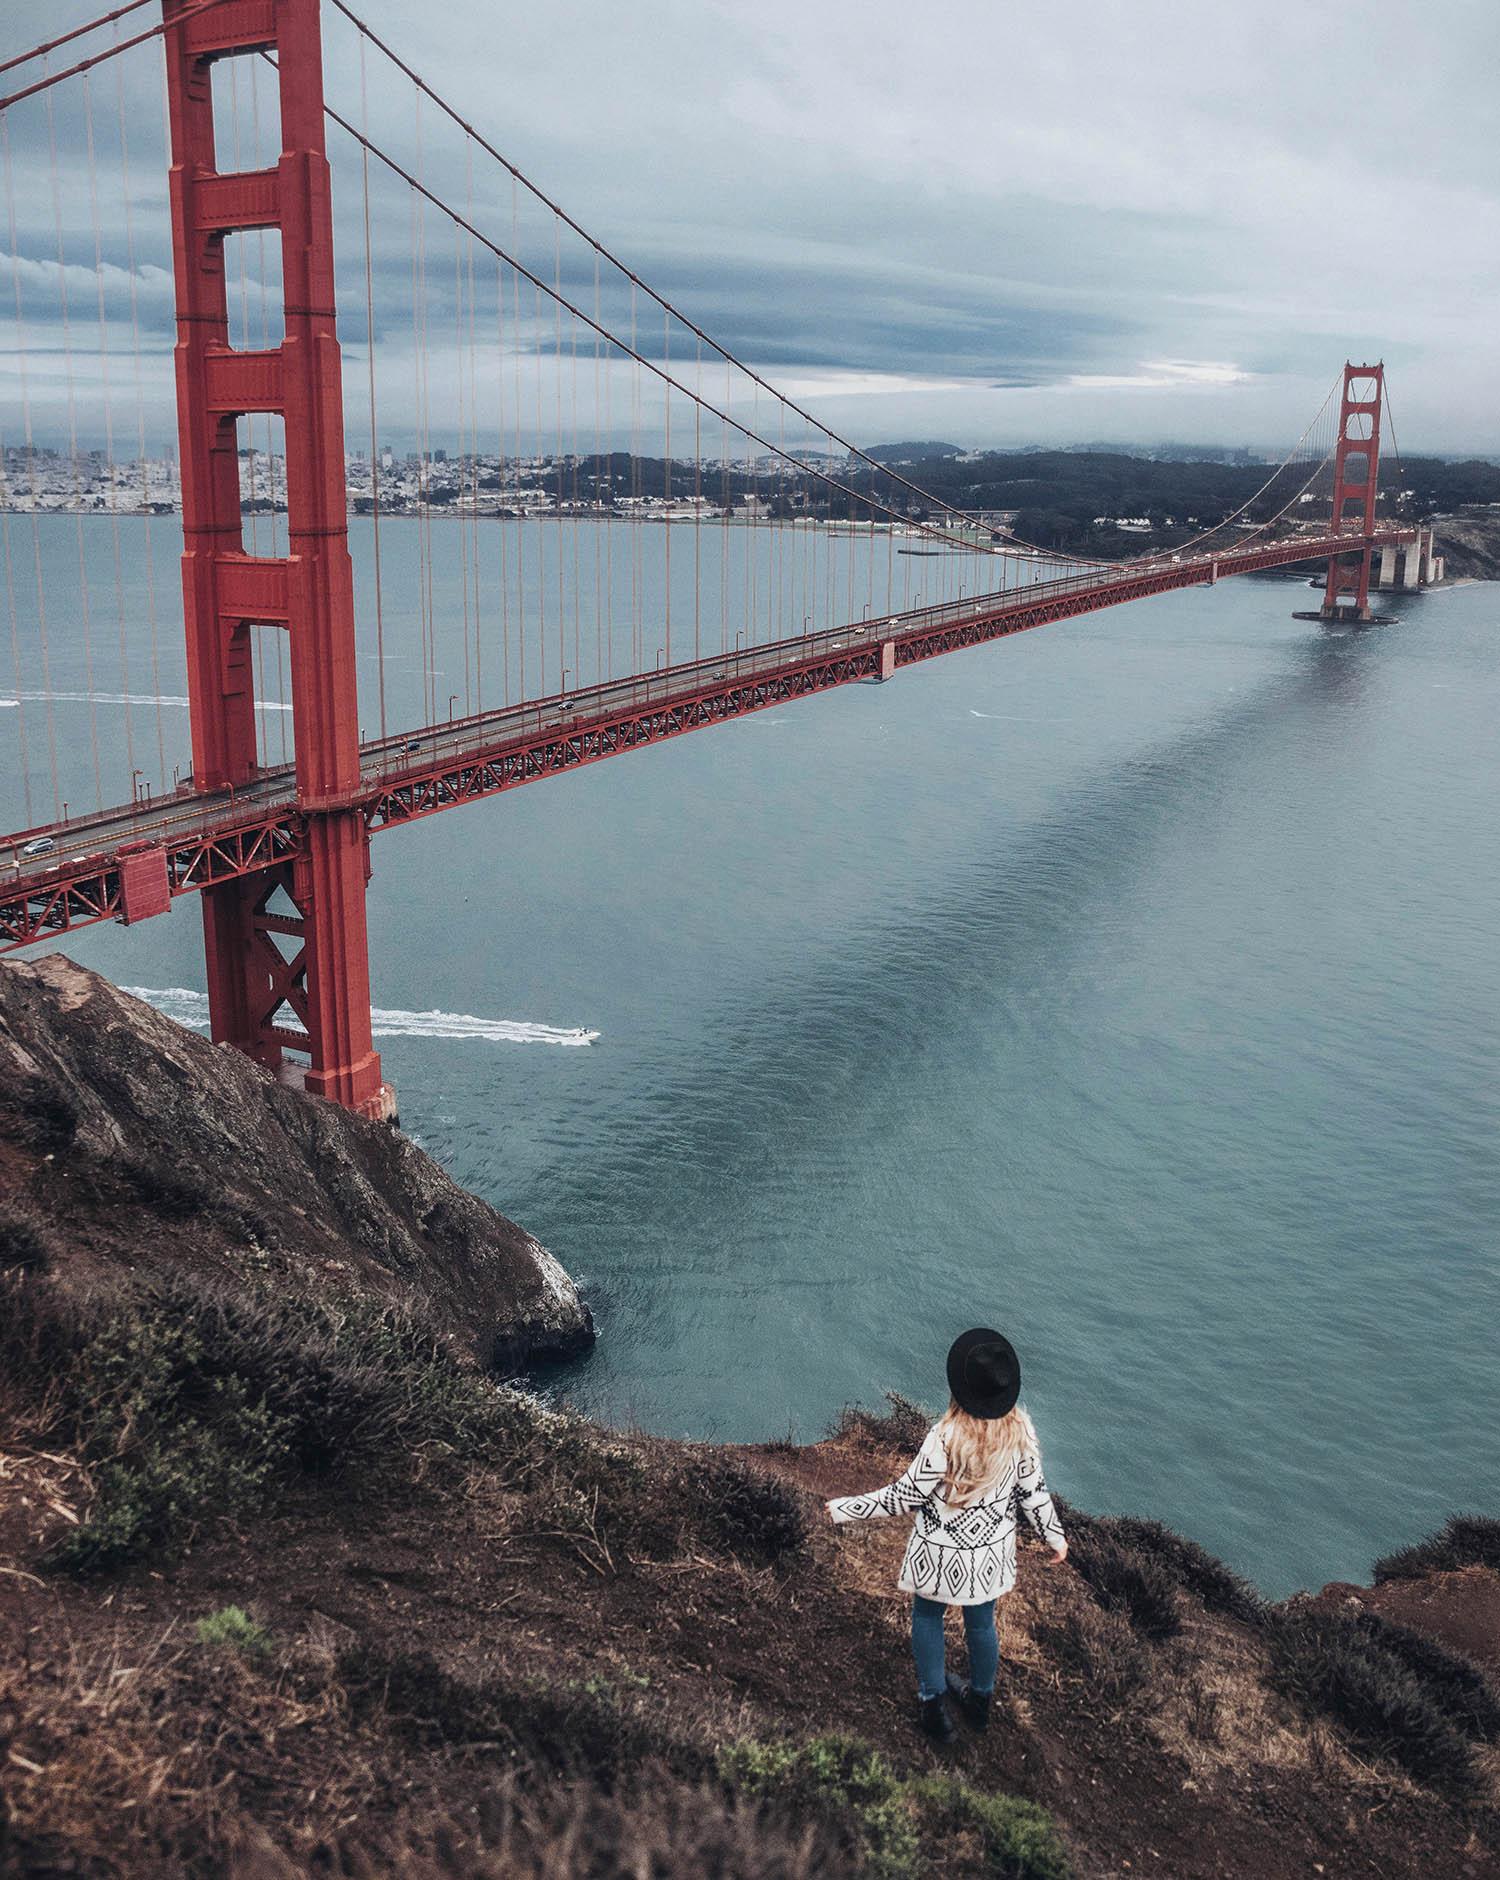 Adaras by Golden Gate Bridge - Battery Spencer in San Francisco